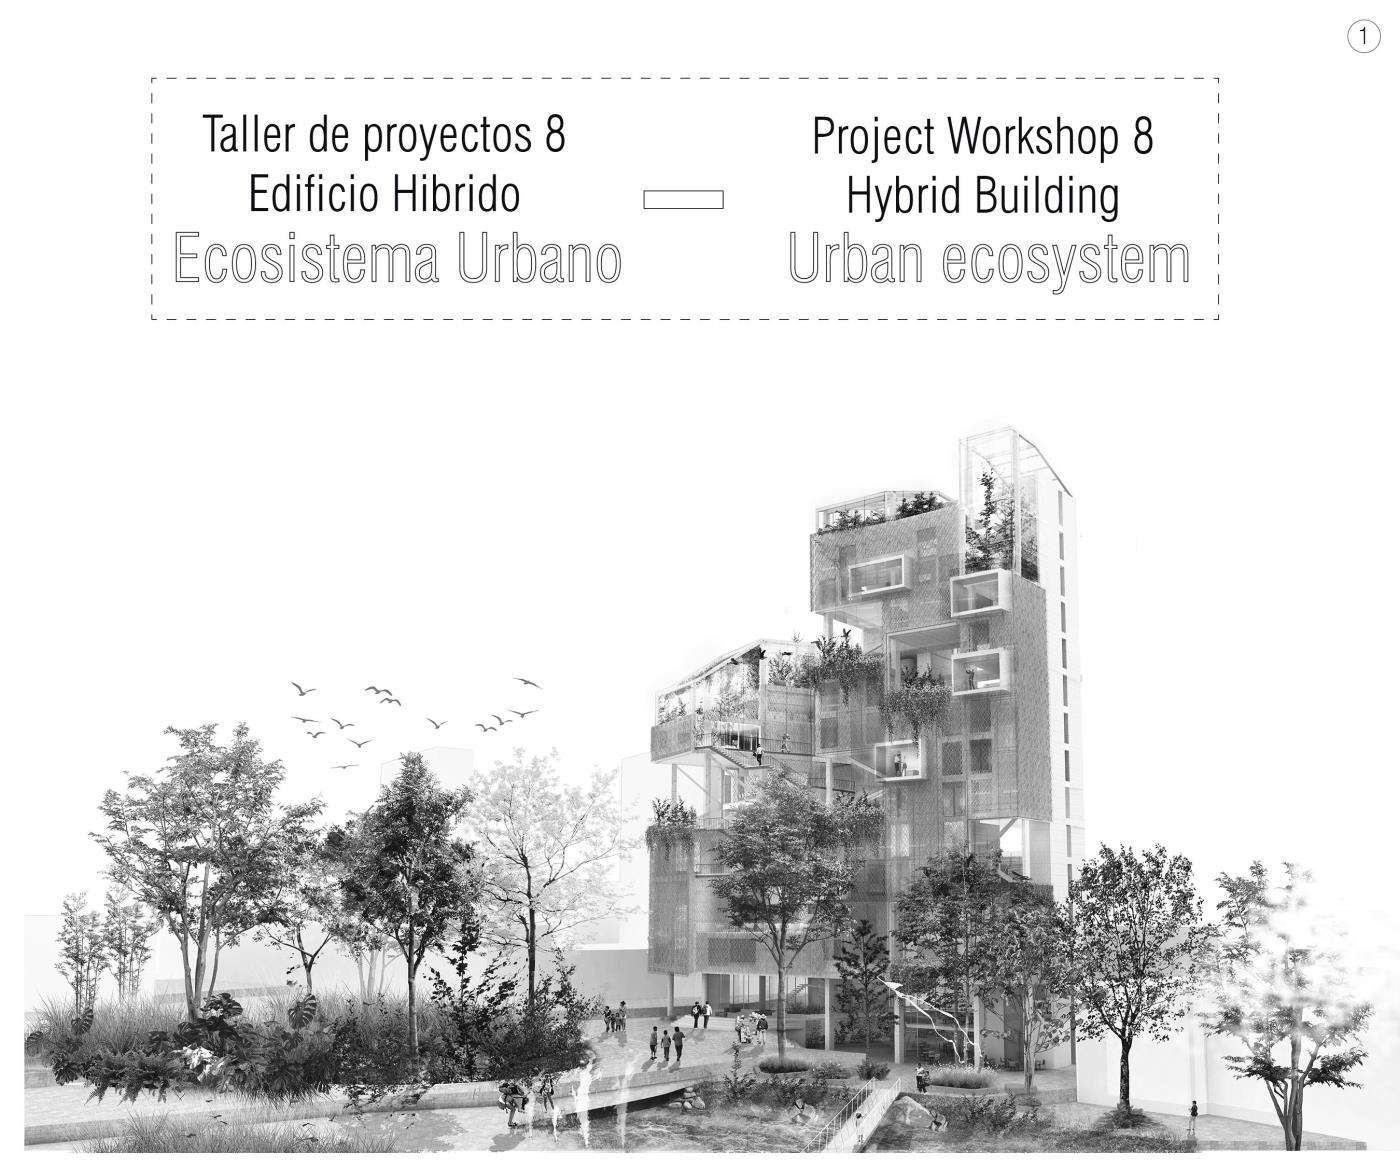 Hybrid Building - Urban Ecosystem